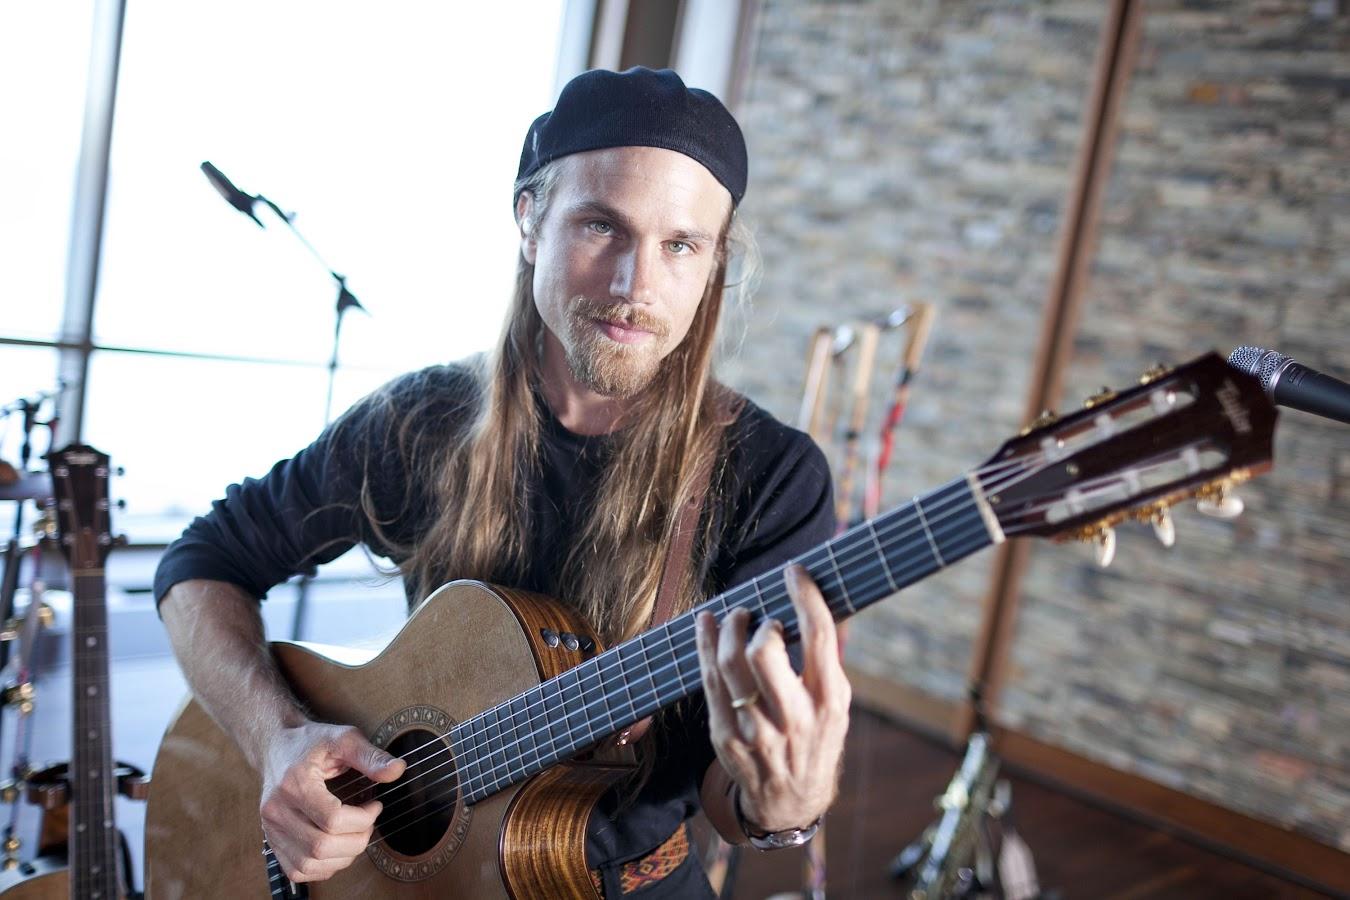 World Musician Guy Mendilow